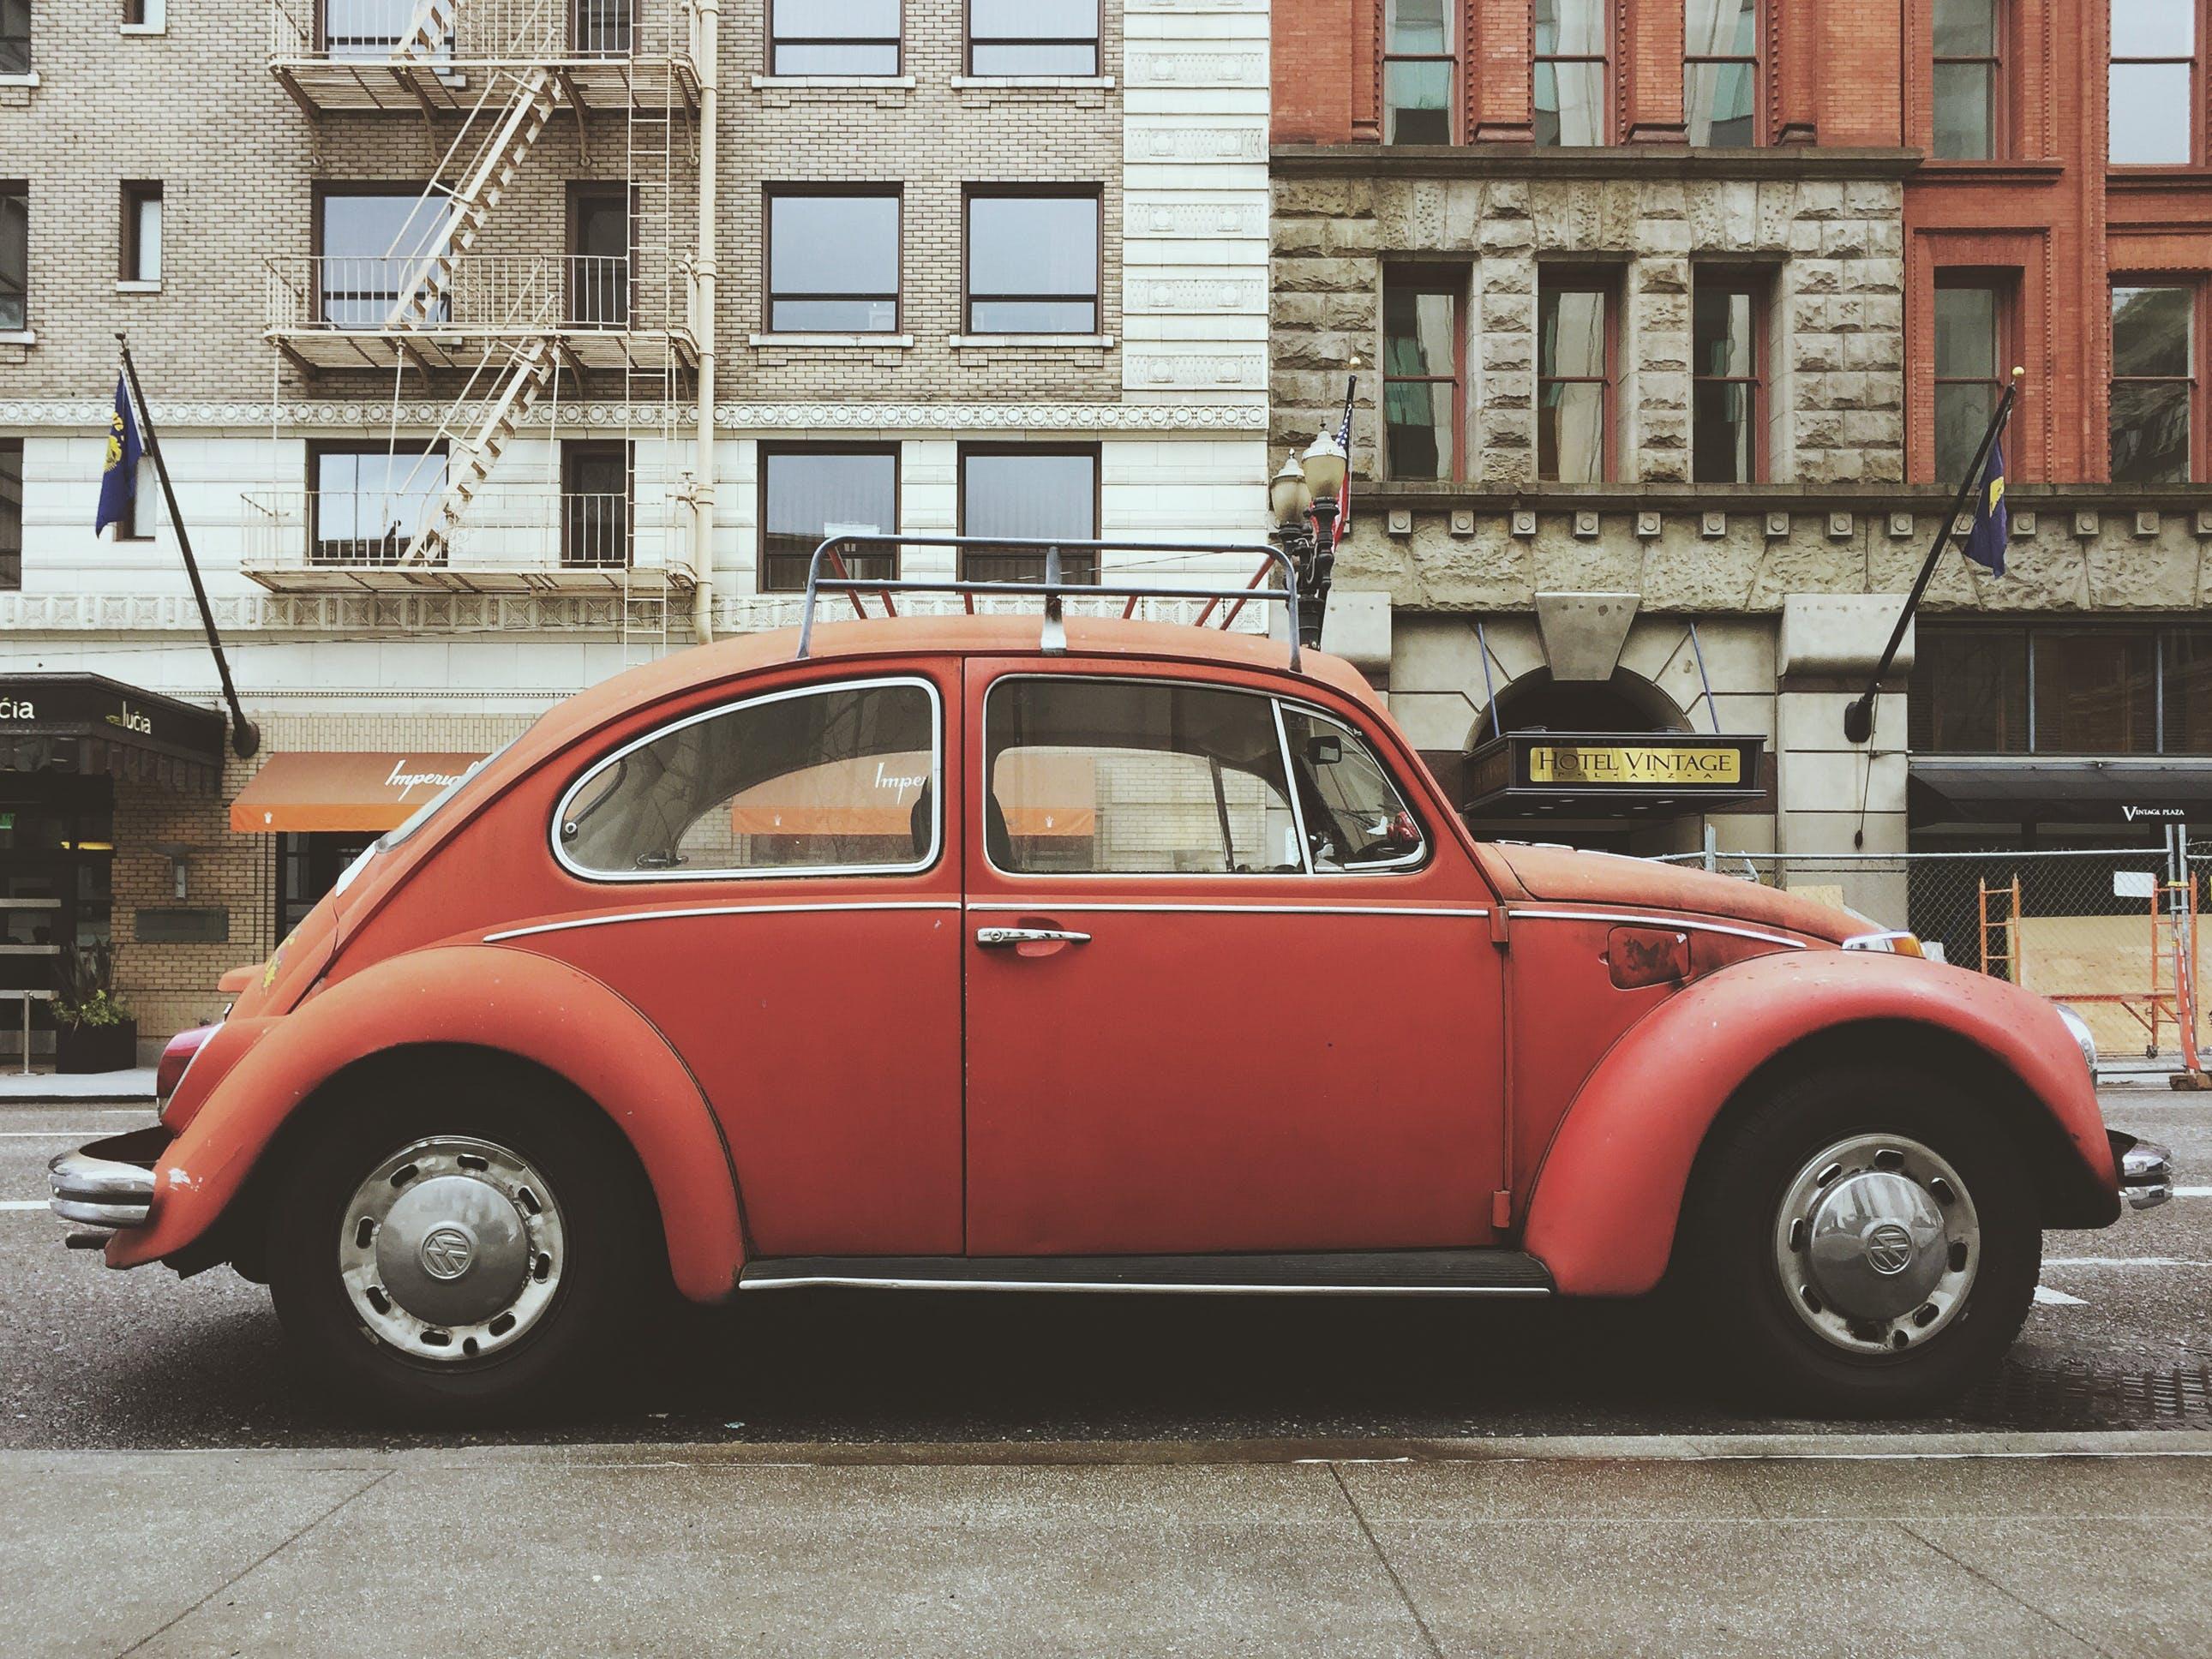 vw 甲蟲, 交通系統, 公開表演, 城市攝影 的